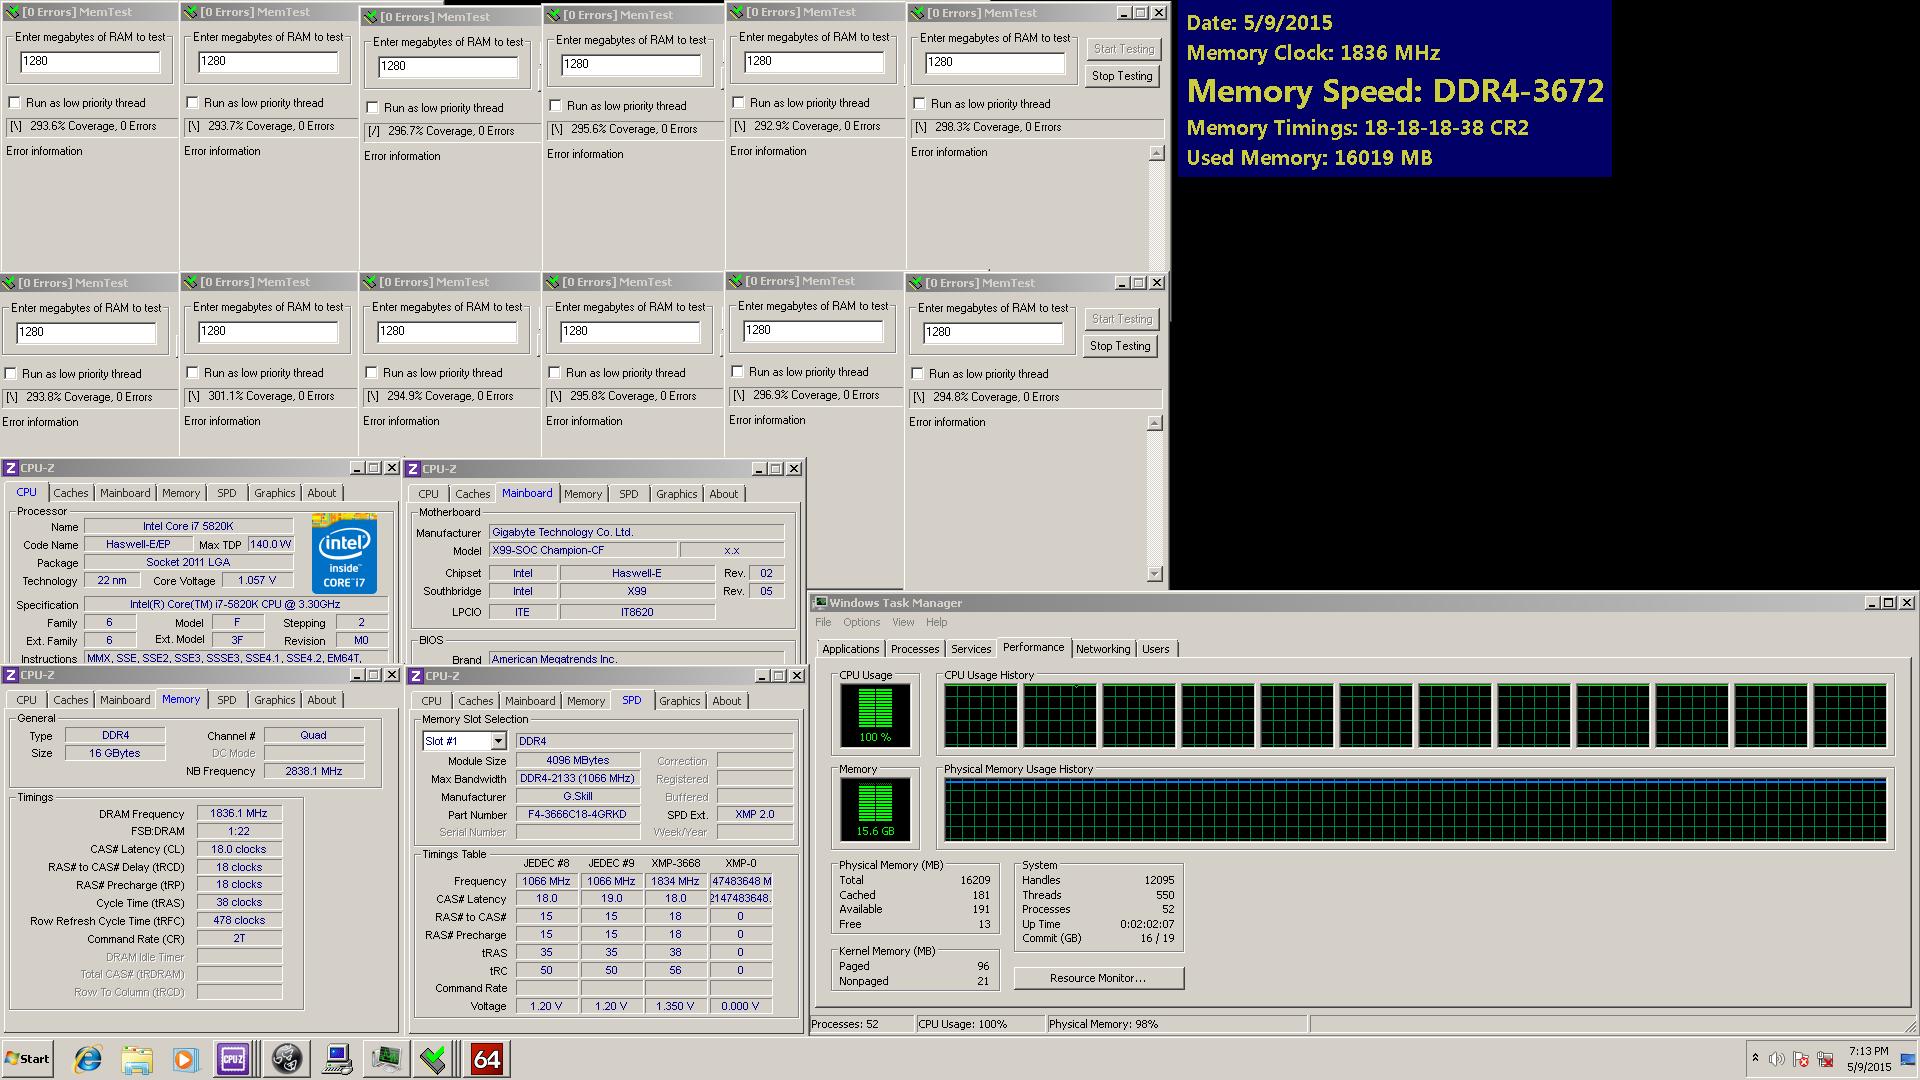 G SKILL Ripjaws 4 Series DDR4 3666MHz Memory kit Announced